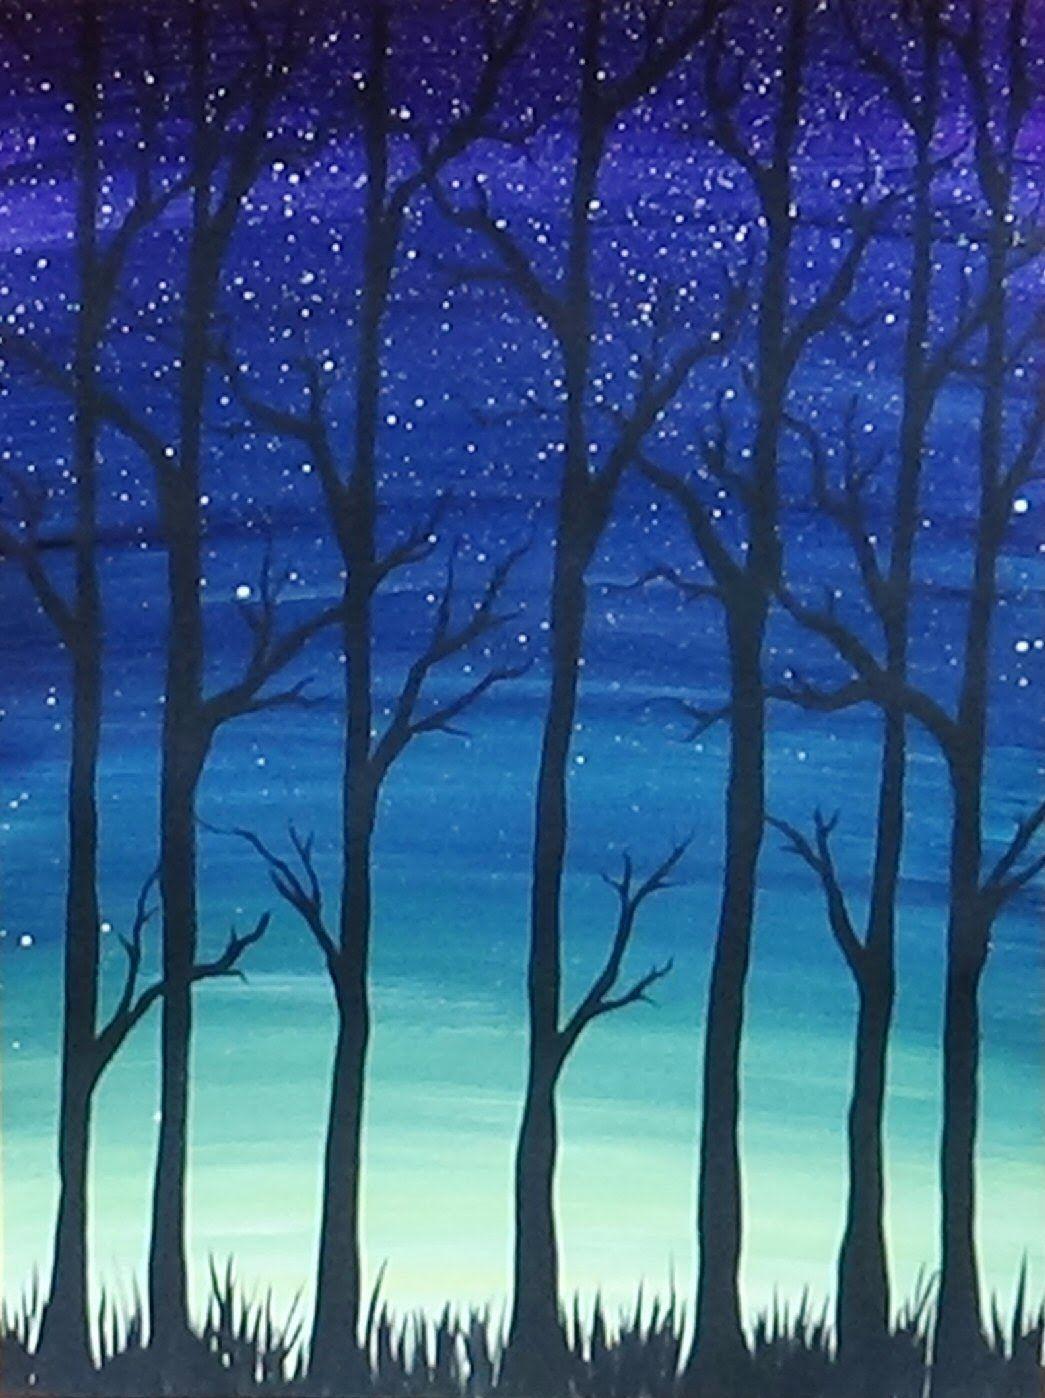 Tree Silhouette Painting : silhouette, painting, YouTube, Silhouette, Painting,, Silhouette,, Sillouette, Painting